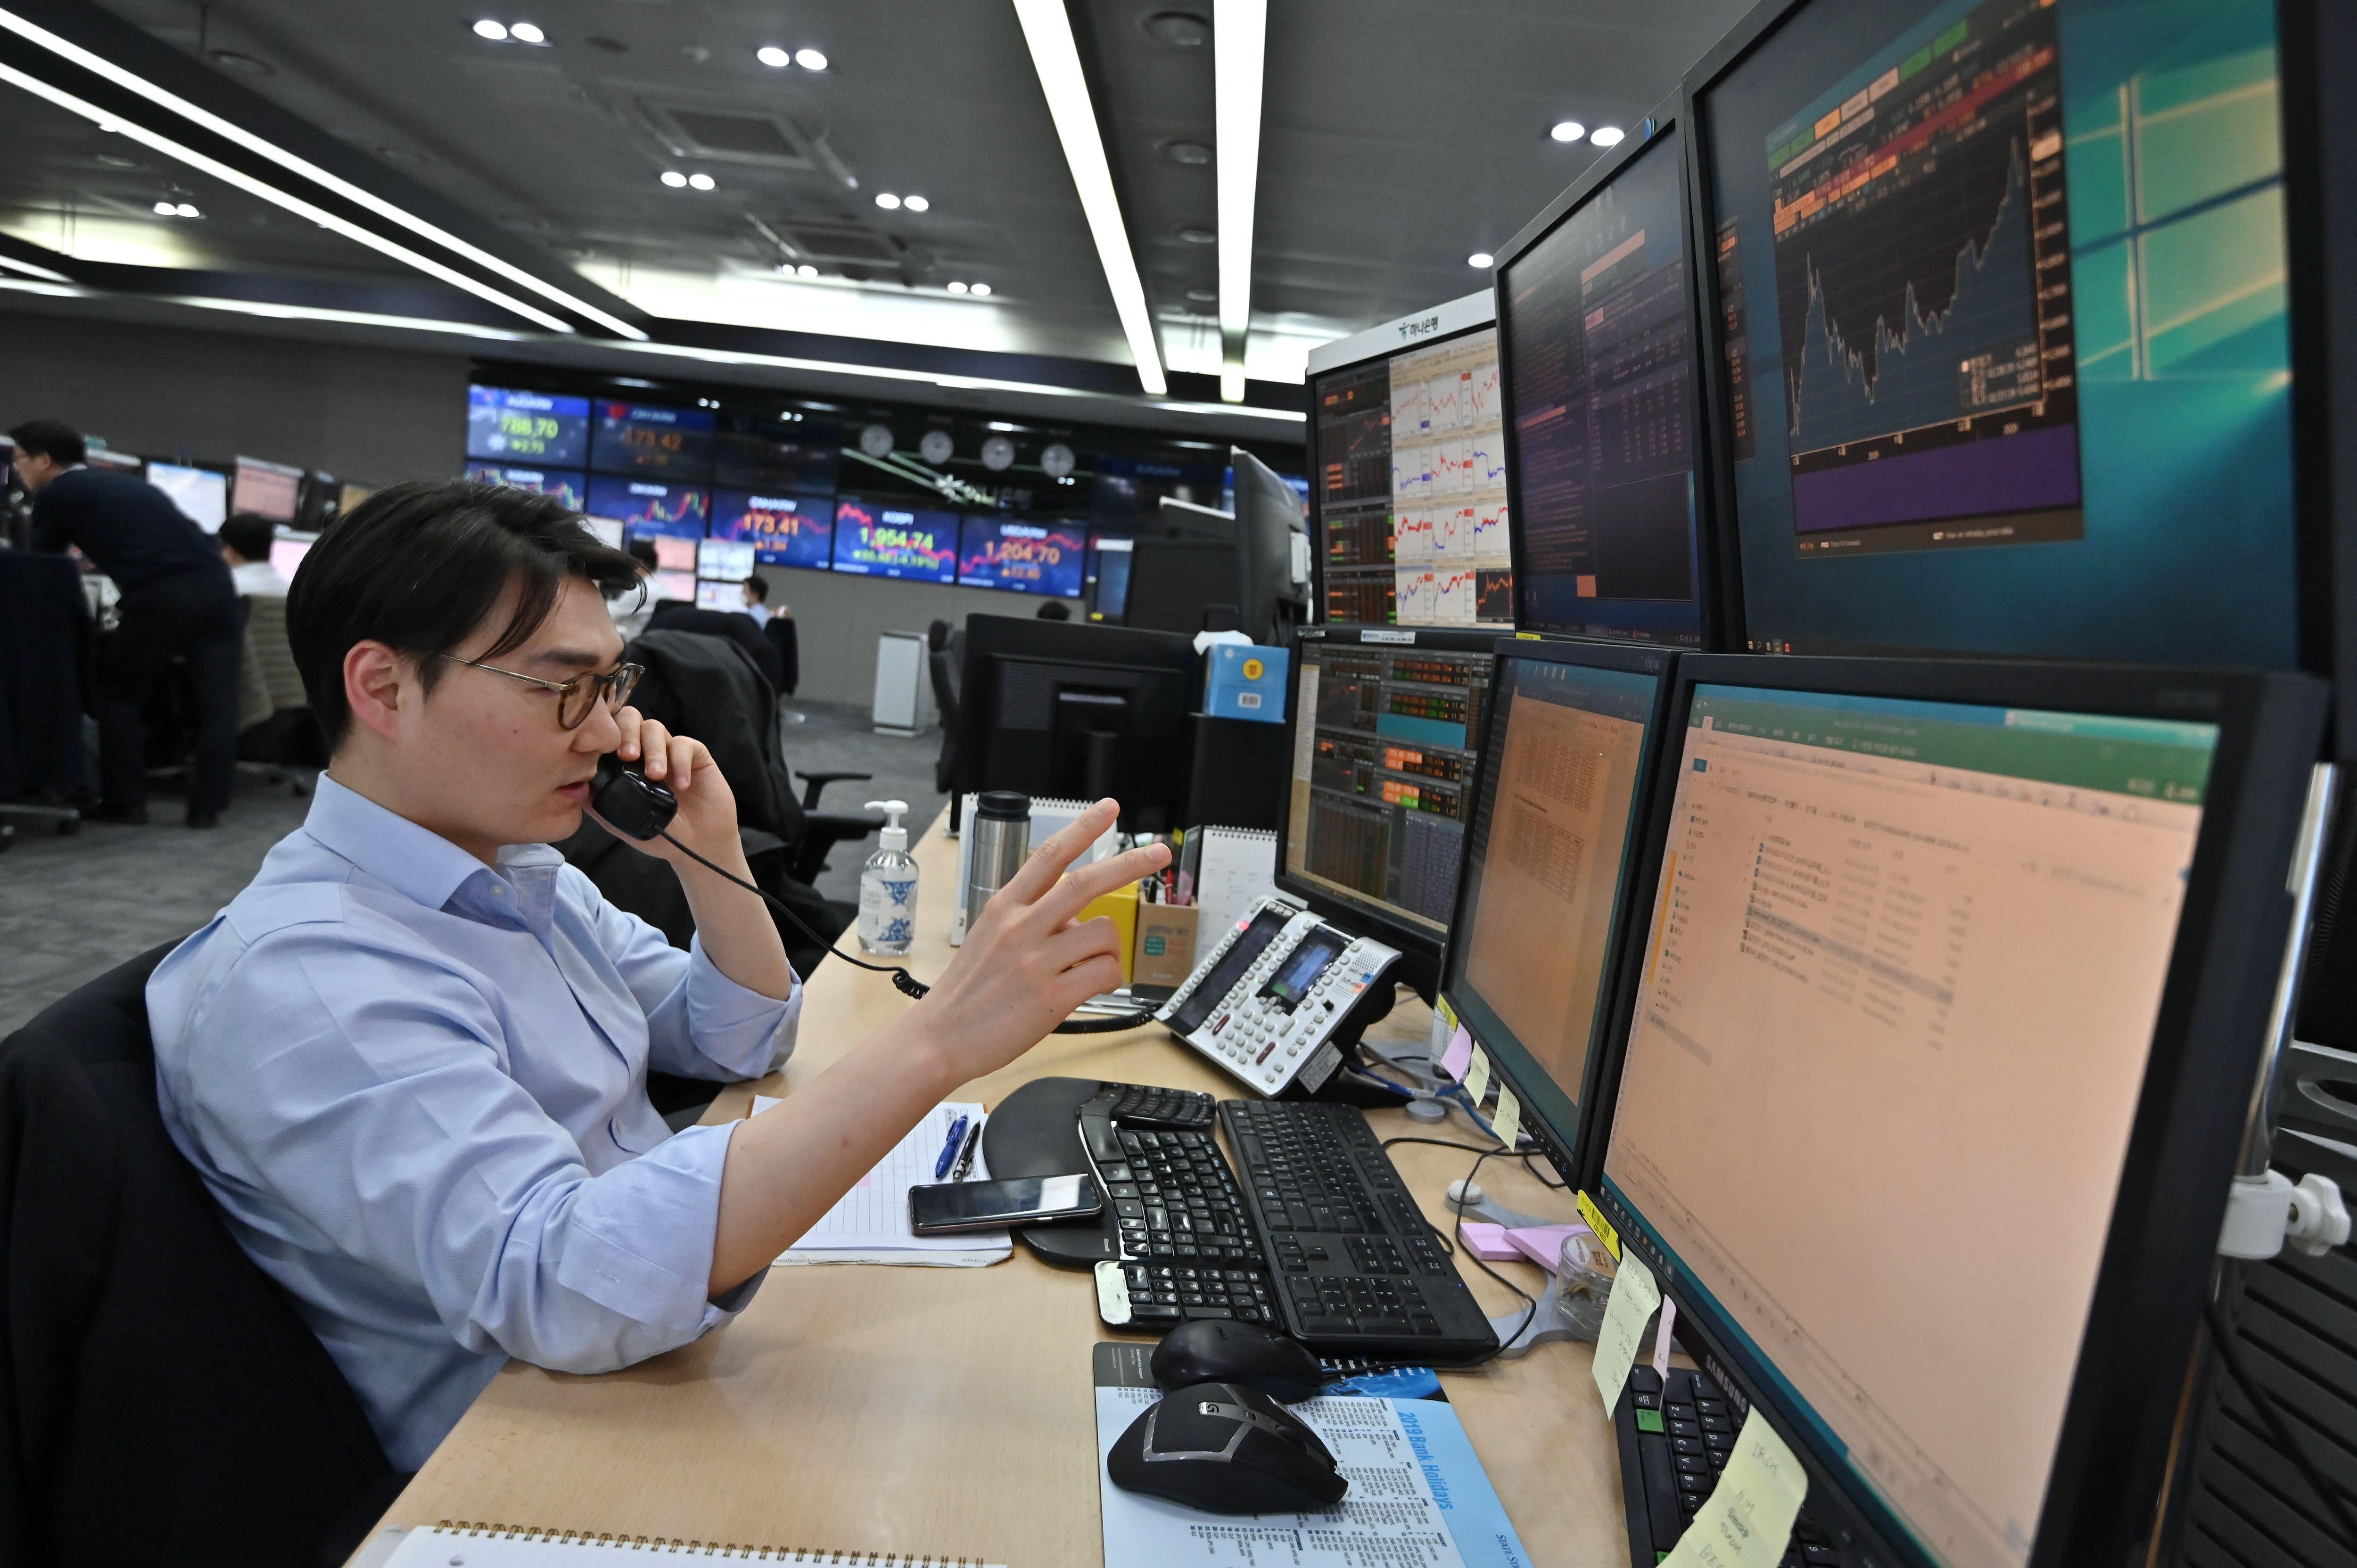 www.cnbc.com: Asia-Pacific airline stocks take a hit as coronavirus concerns return; South Korea drops more than 2%